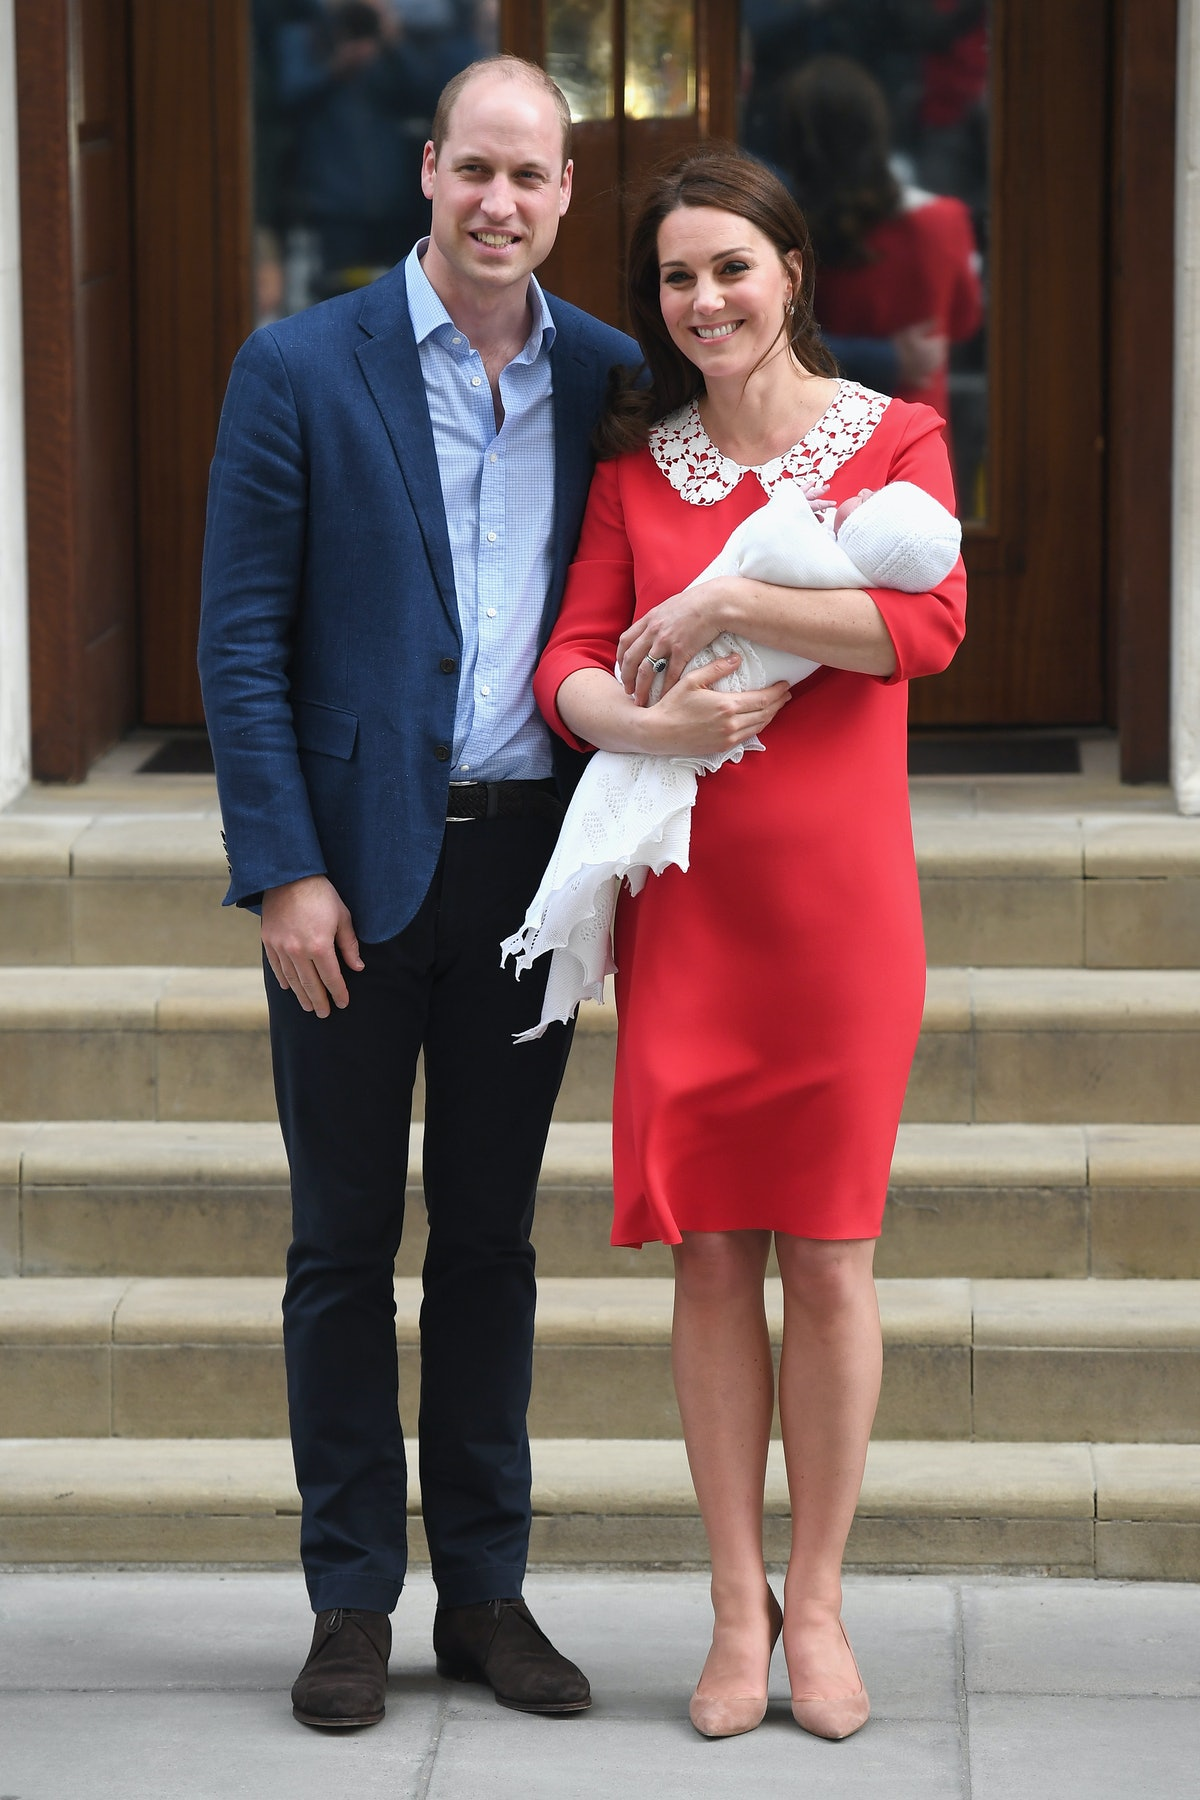 kate-middleton-prince-william-leaving-hospital-royal-baby-03.jpg